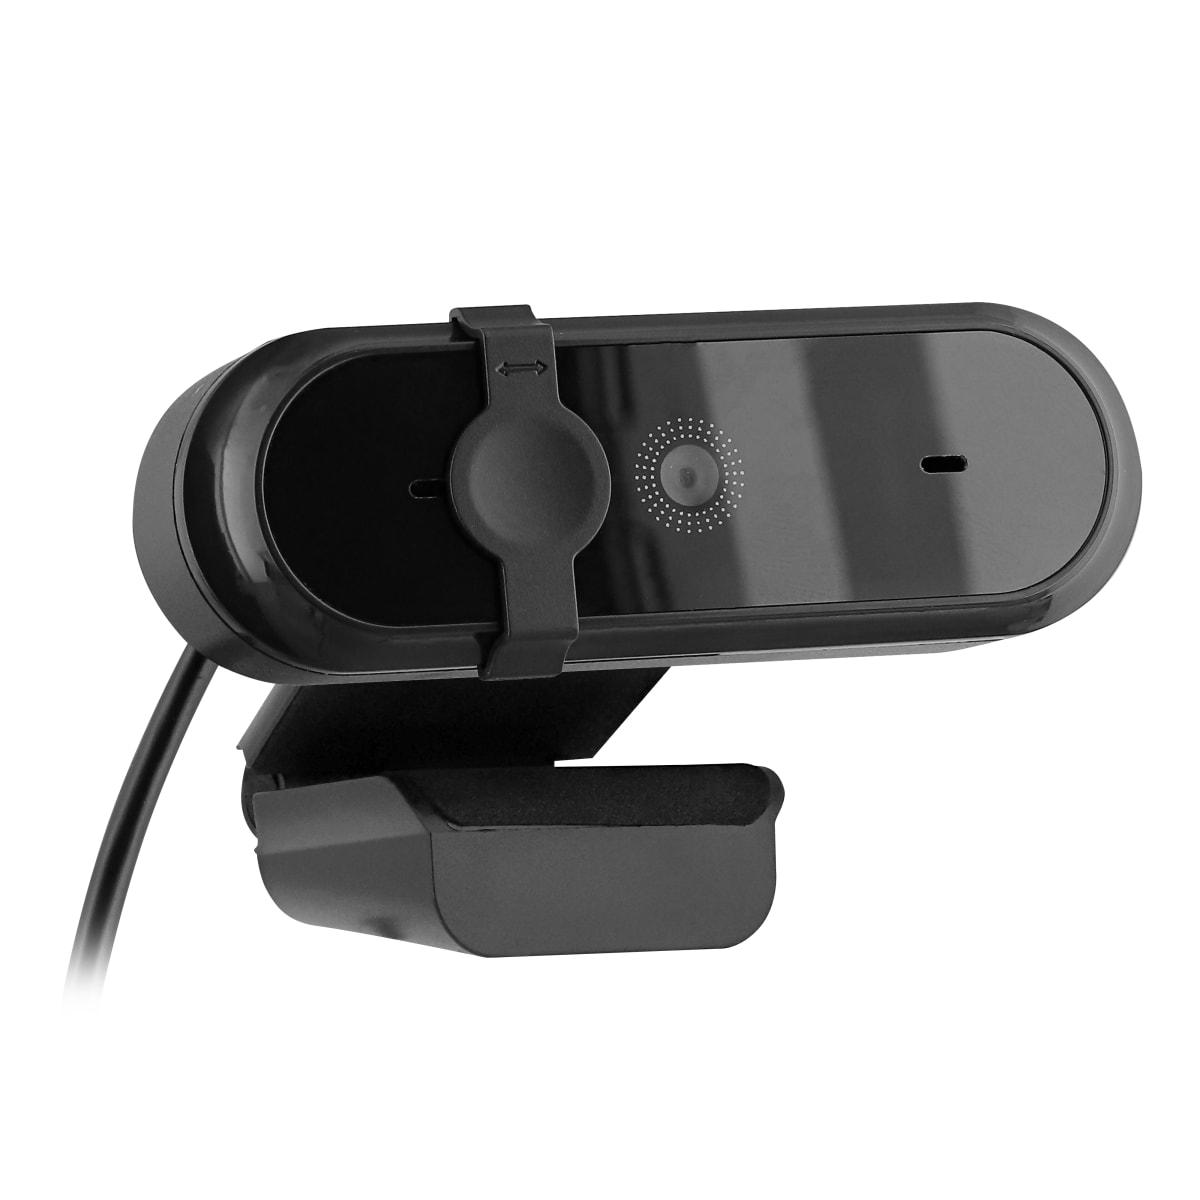 USB 2.0 wired webcam - Full HD 1080P autofocus